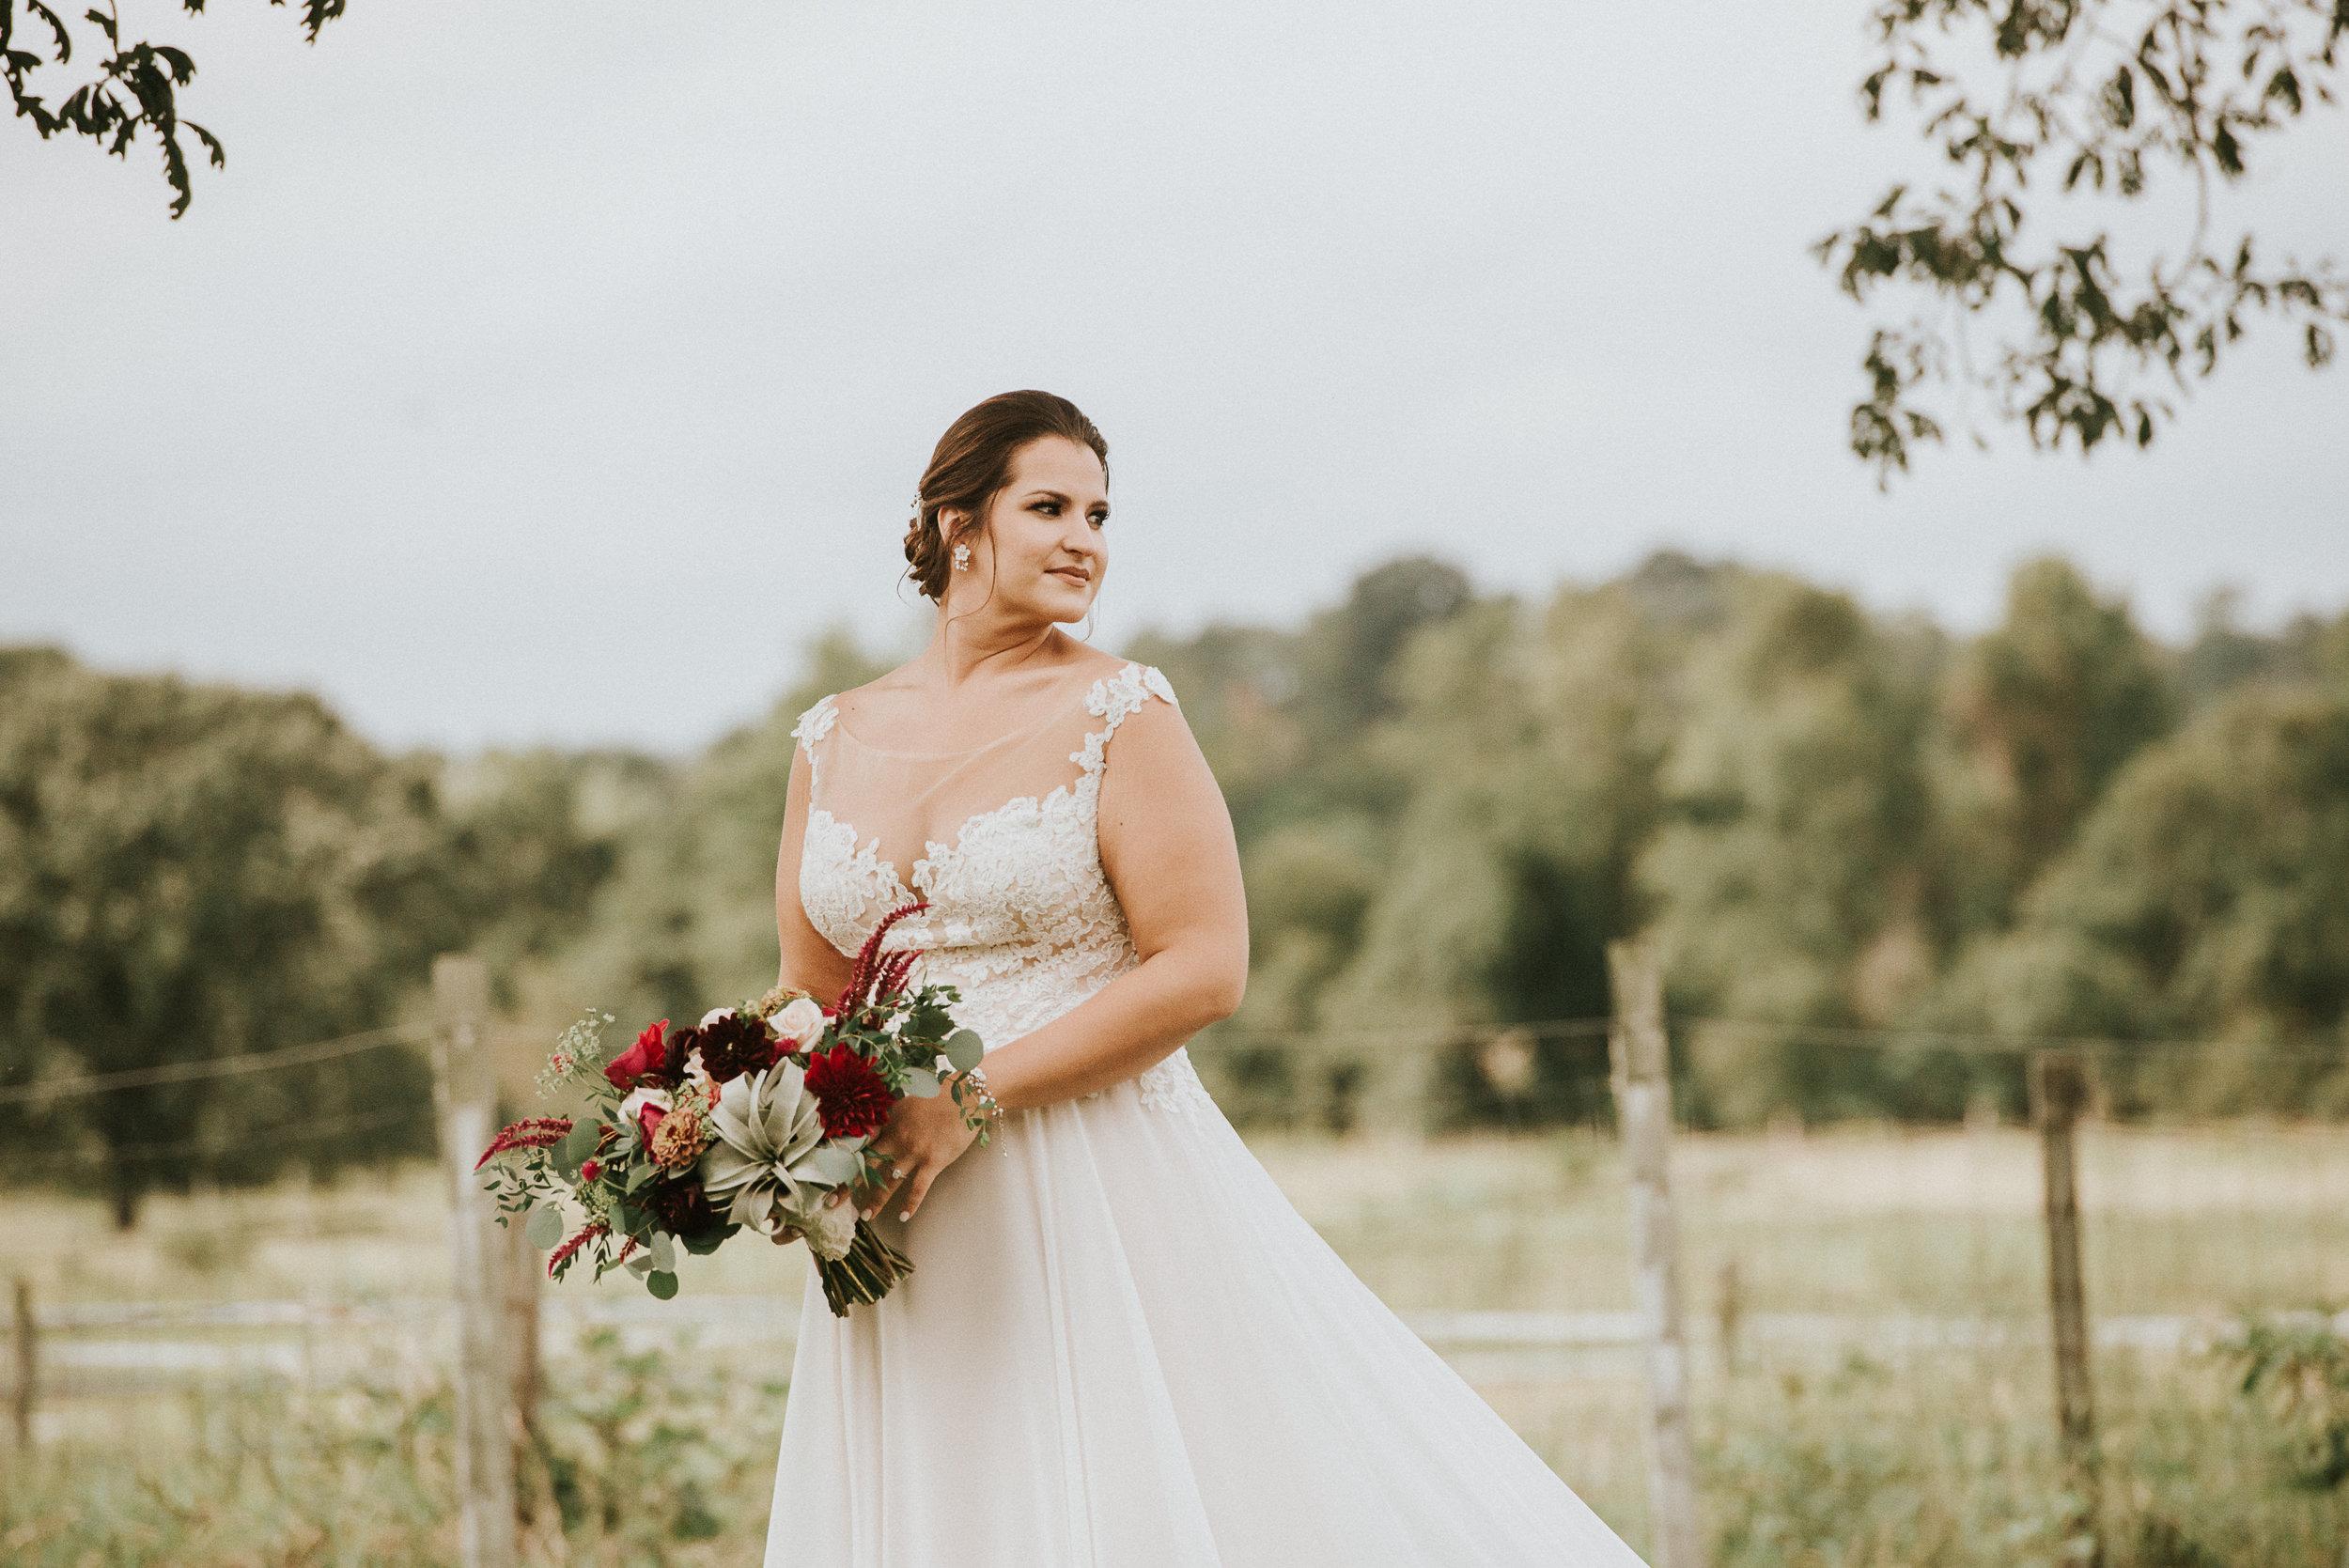 Johnson-Locust-Hall-Farm-Wedding-Christine-Kevin-462.jpg